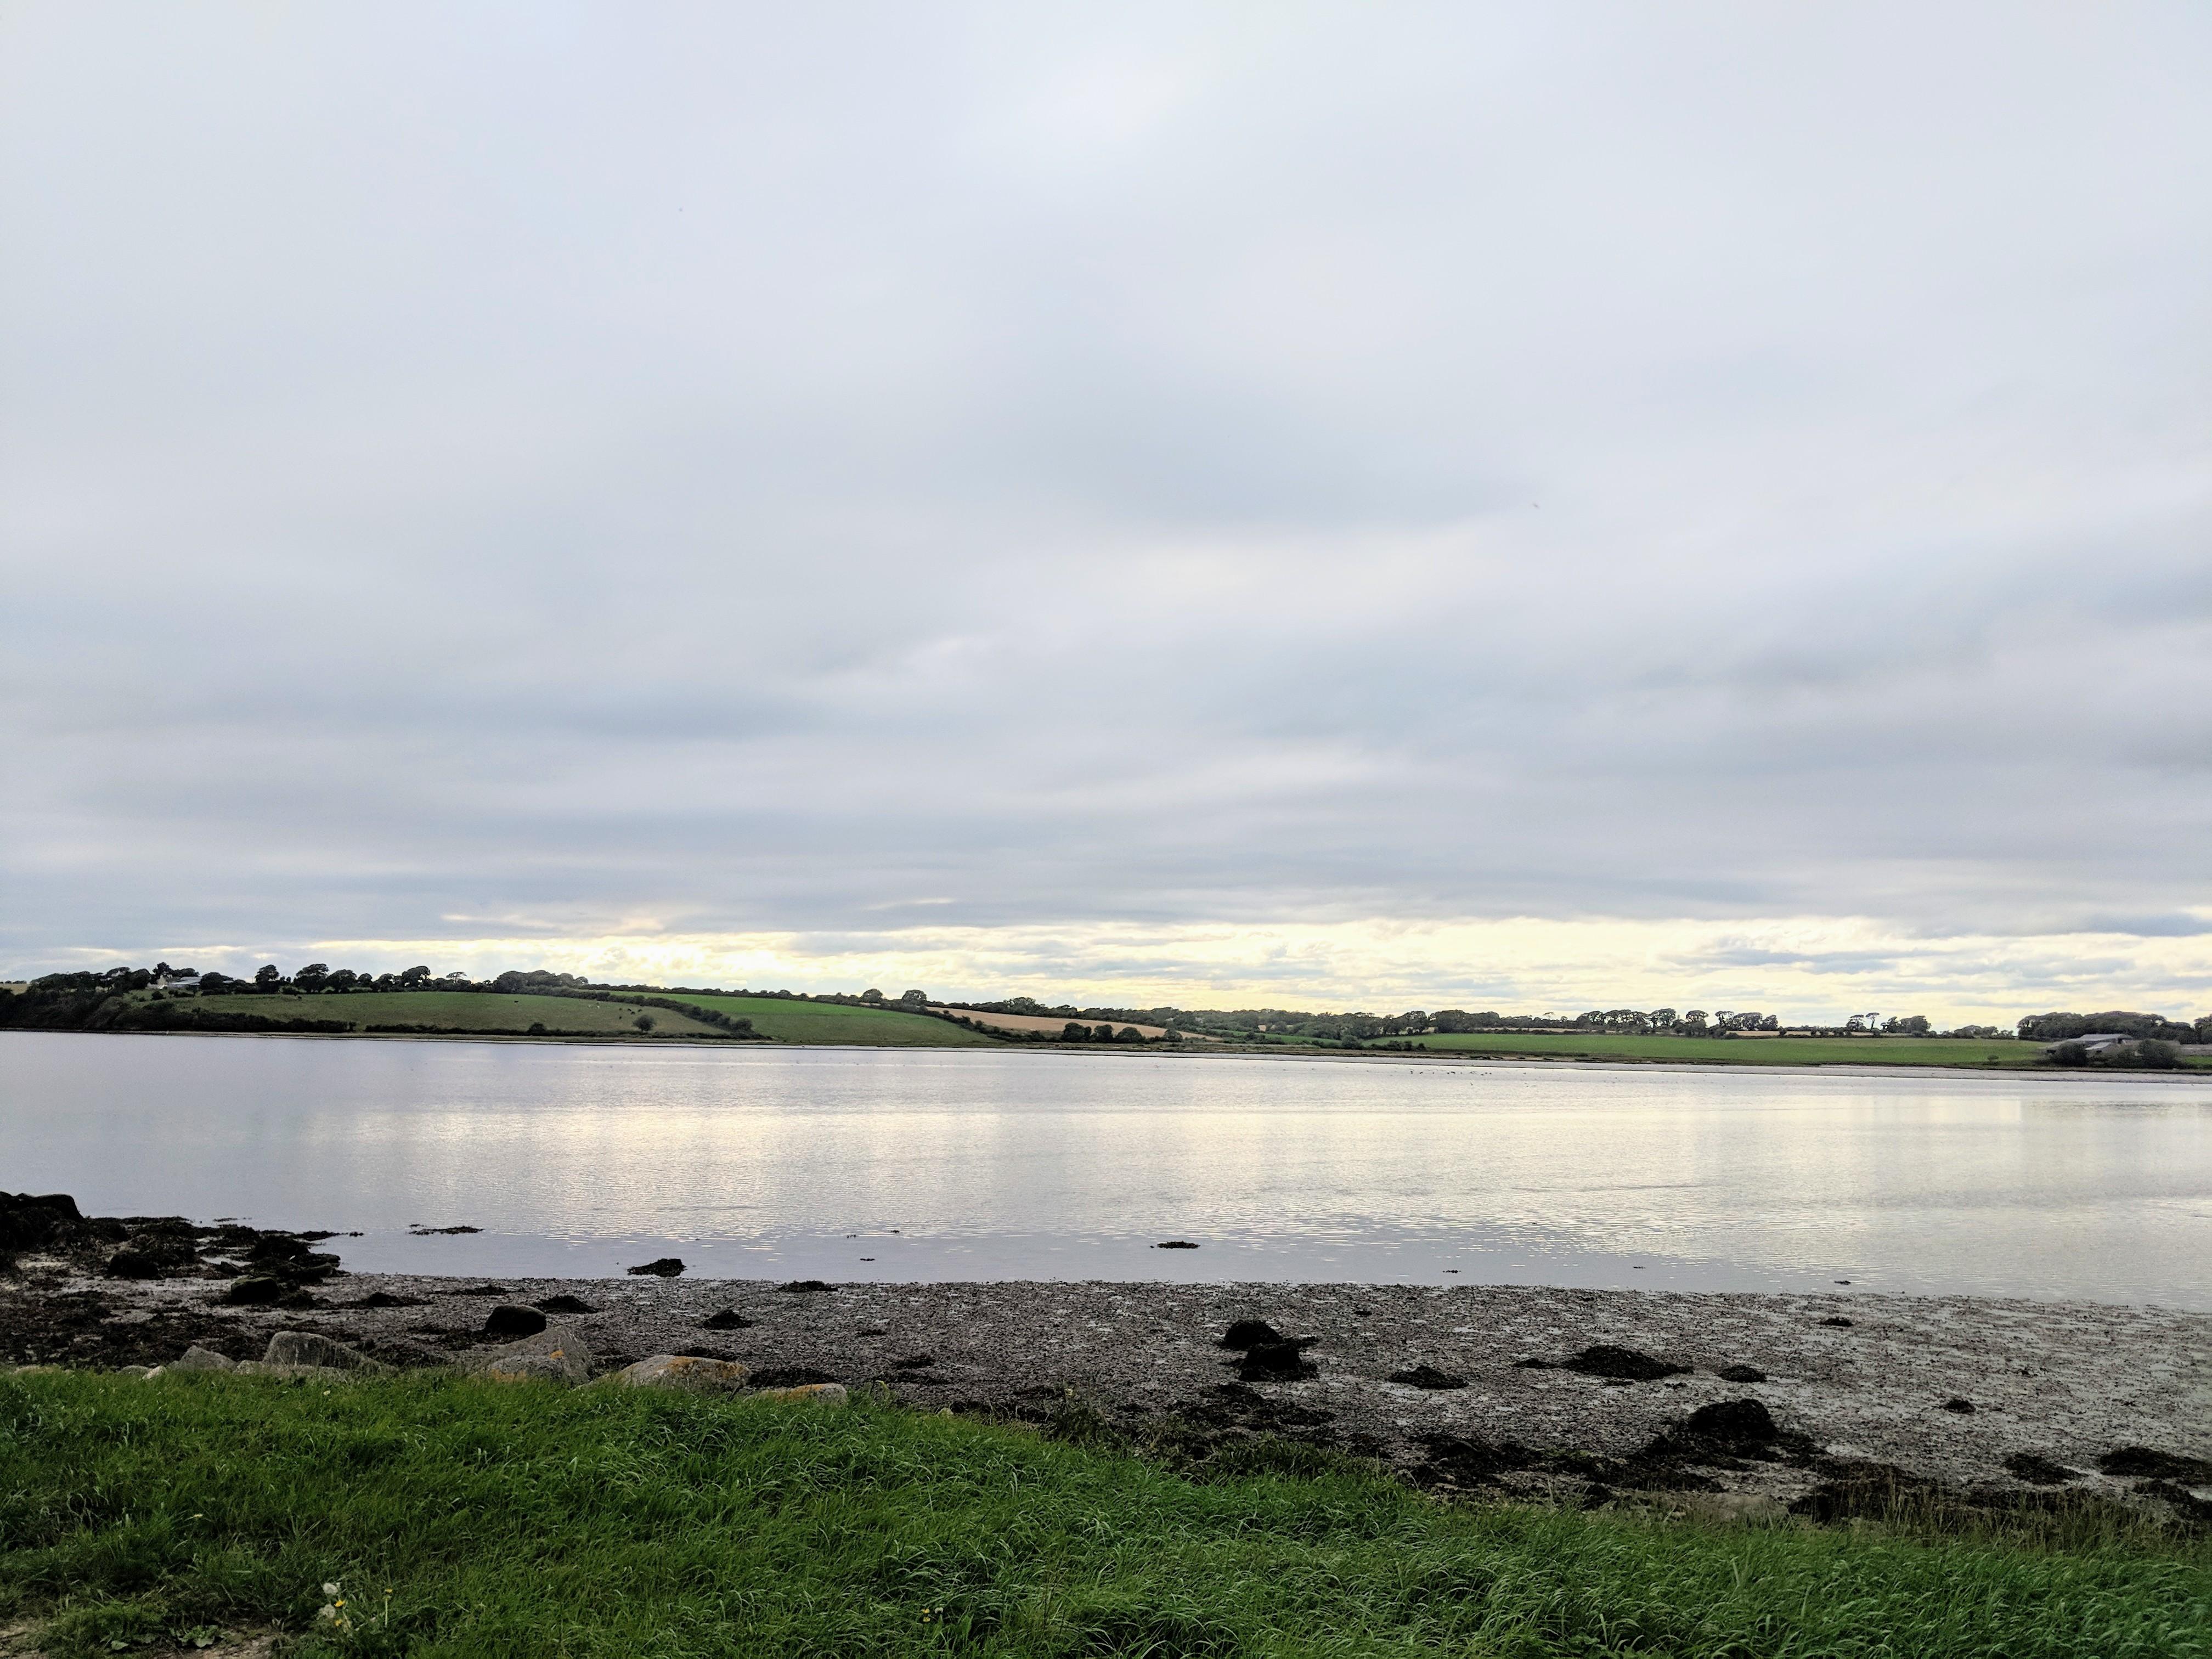 Sea Fishing Opportunities in County Wicklow, Ireland | An Irish